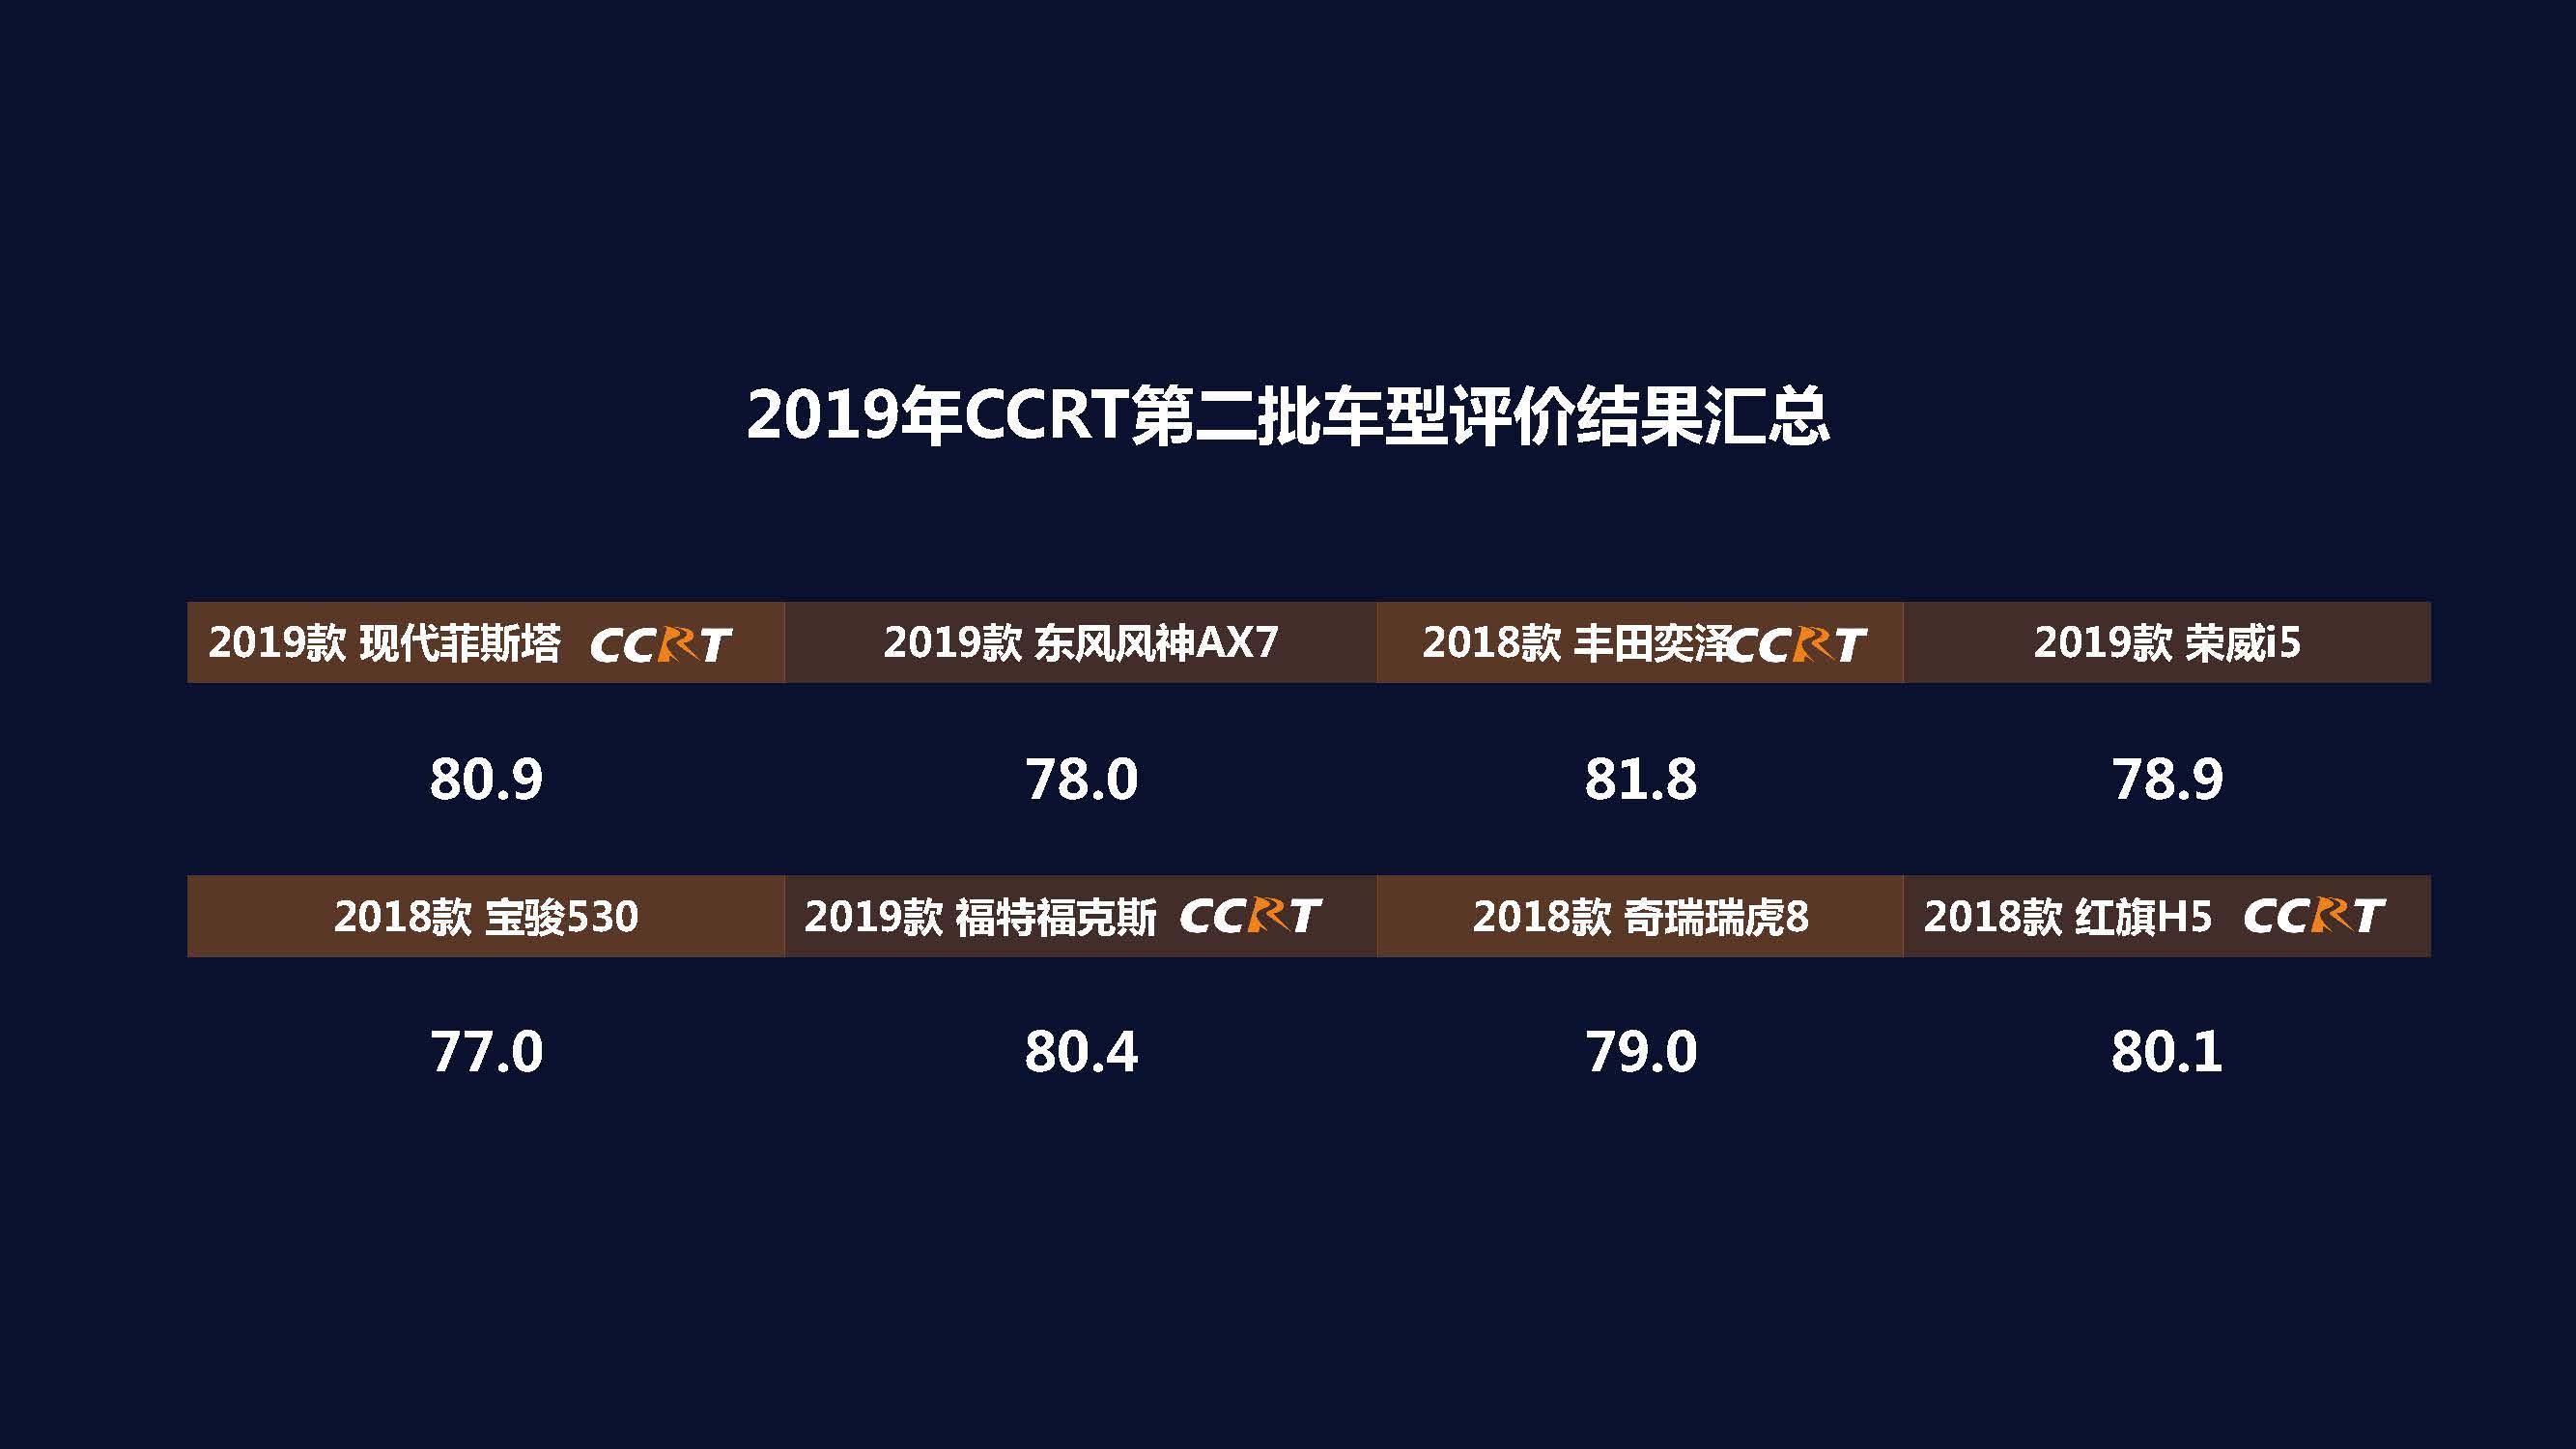 ccrt艺术_2019年度ccrt第二批车型评价结果正式发布